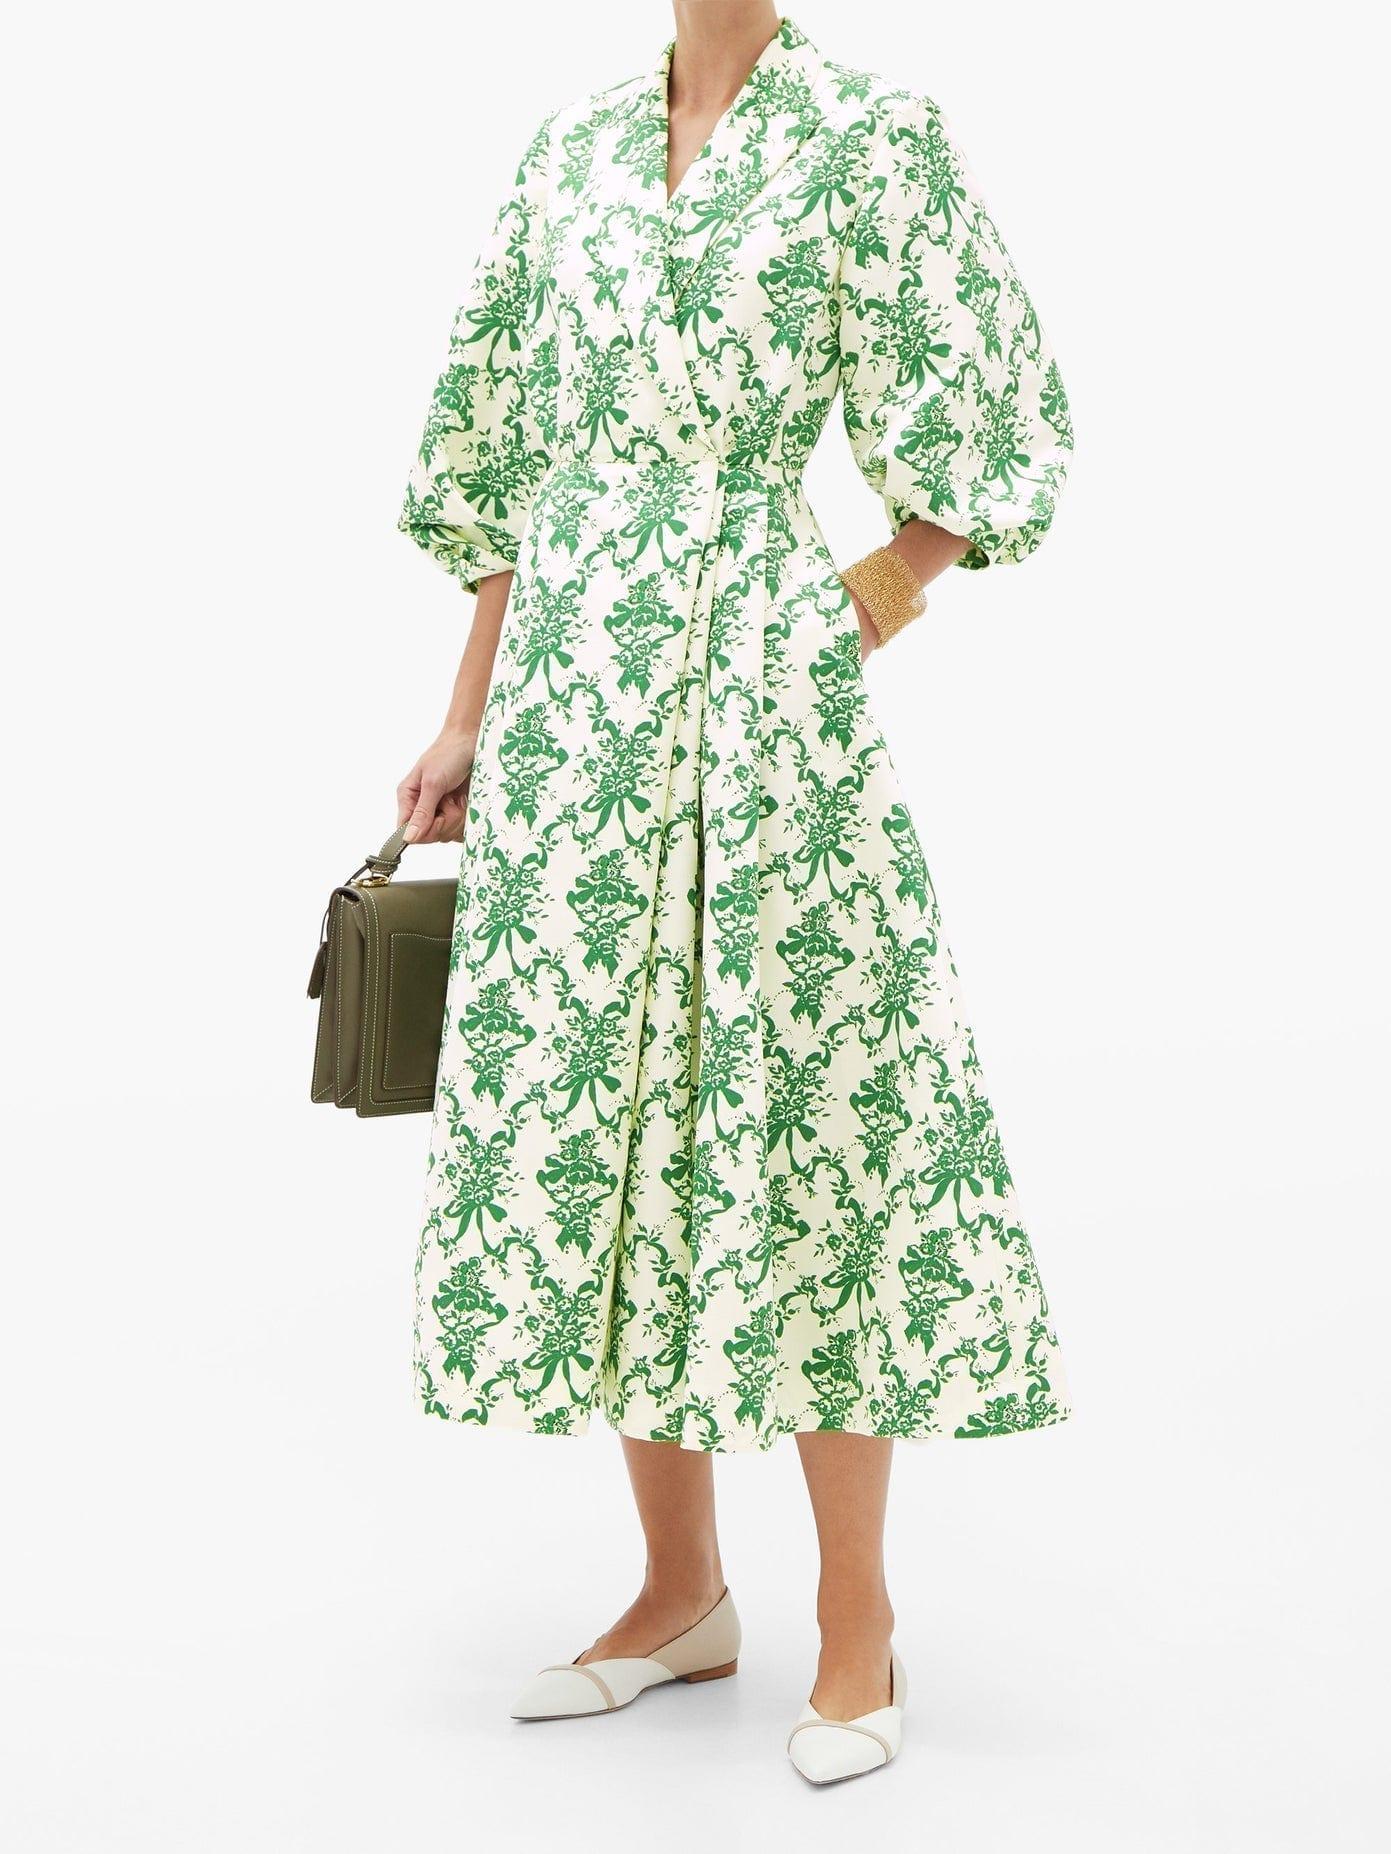 EMILIA WICKSTEAD Goldie Floral-print Faille Blazer Dress